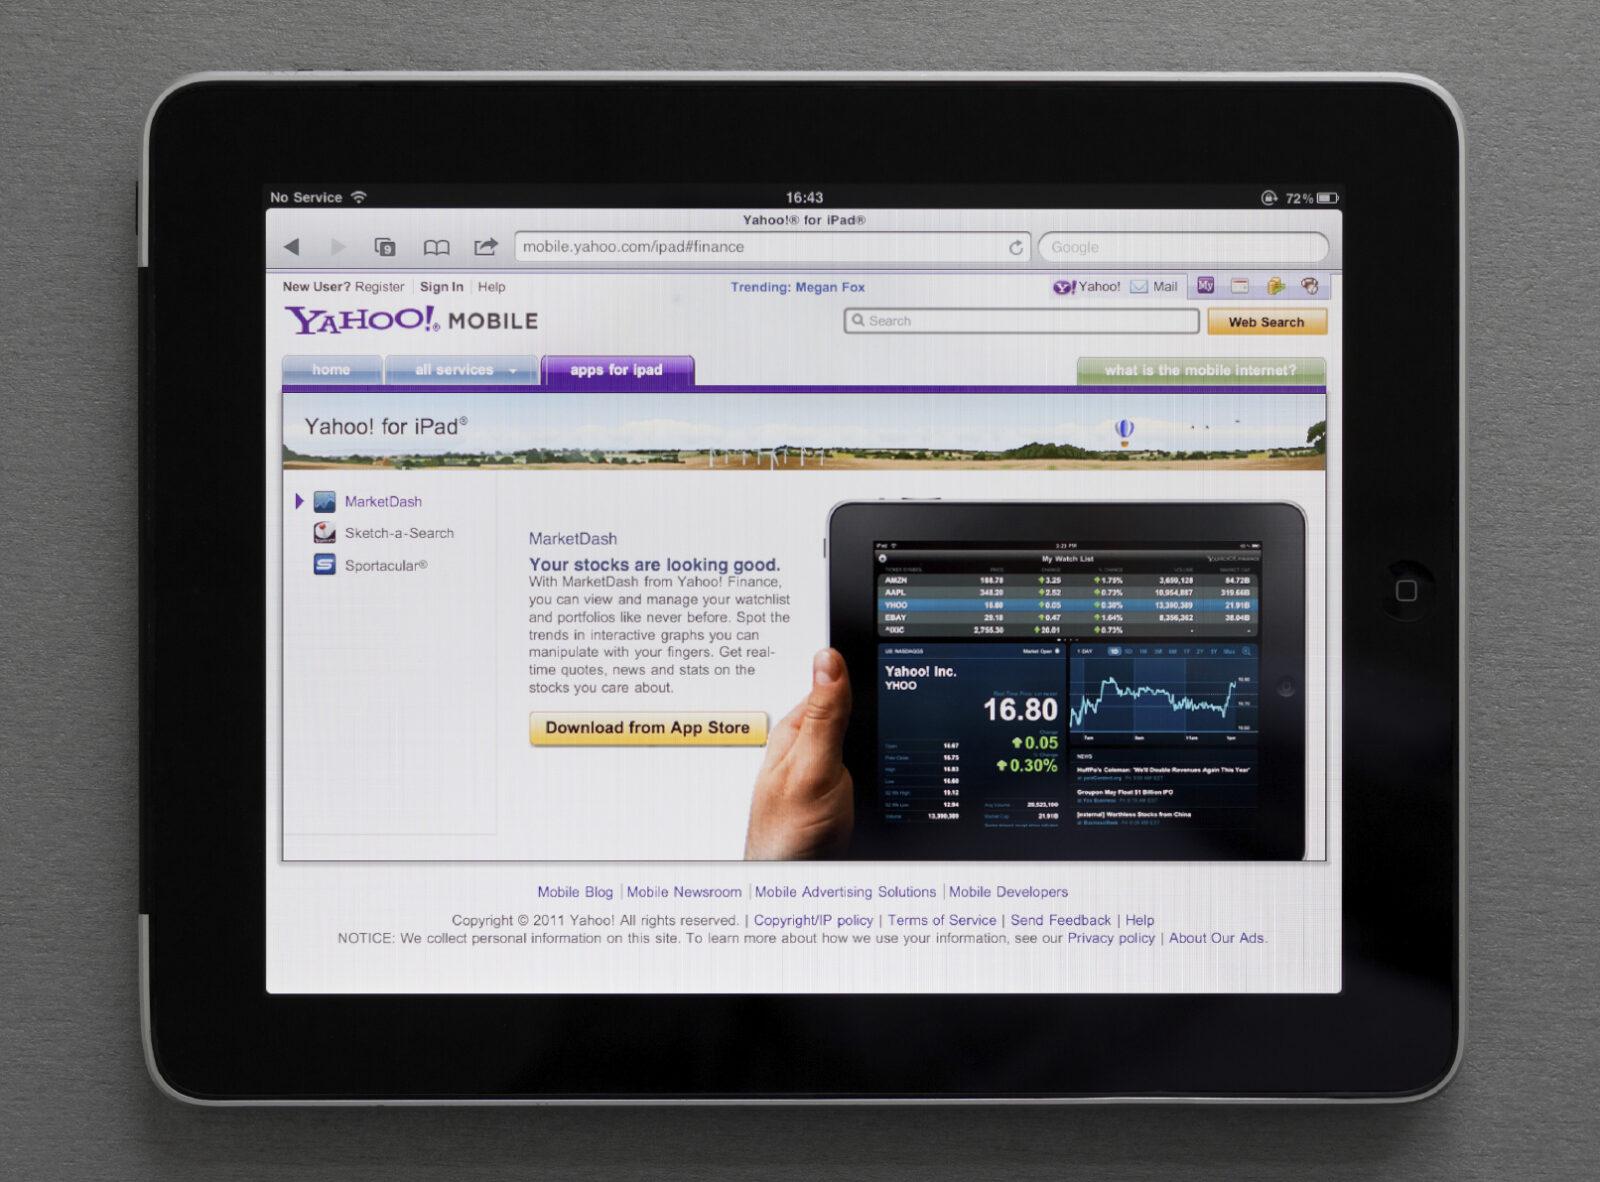 Apple Ipad showing Yahoo web page